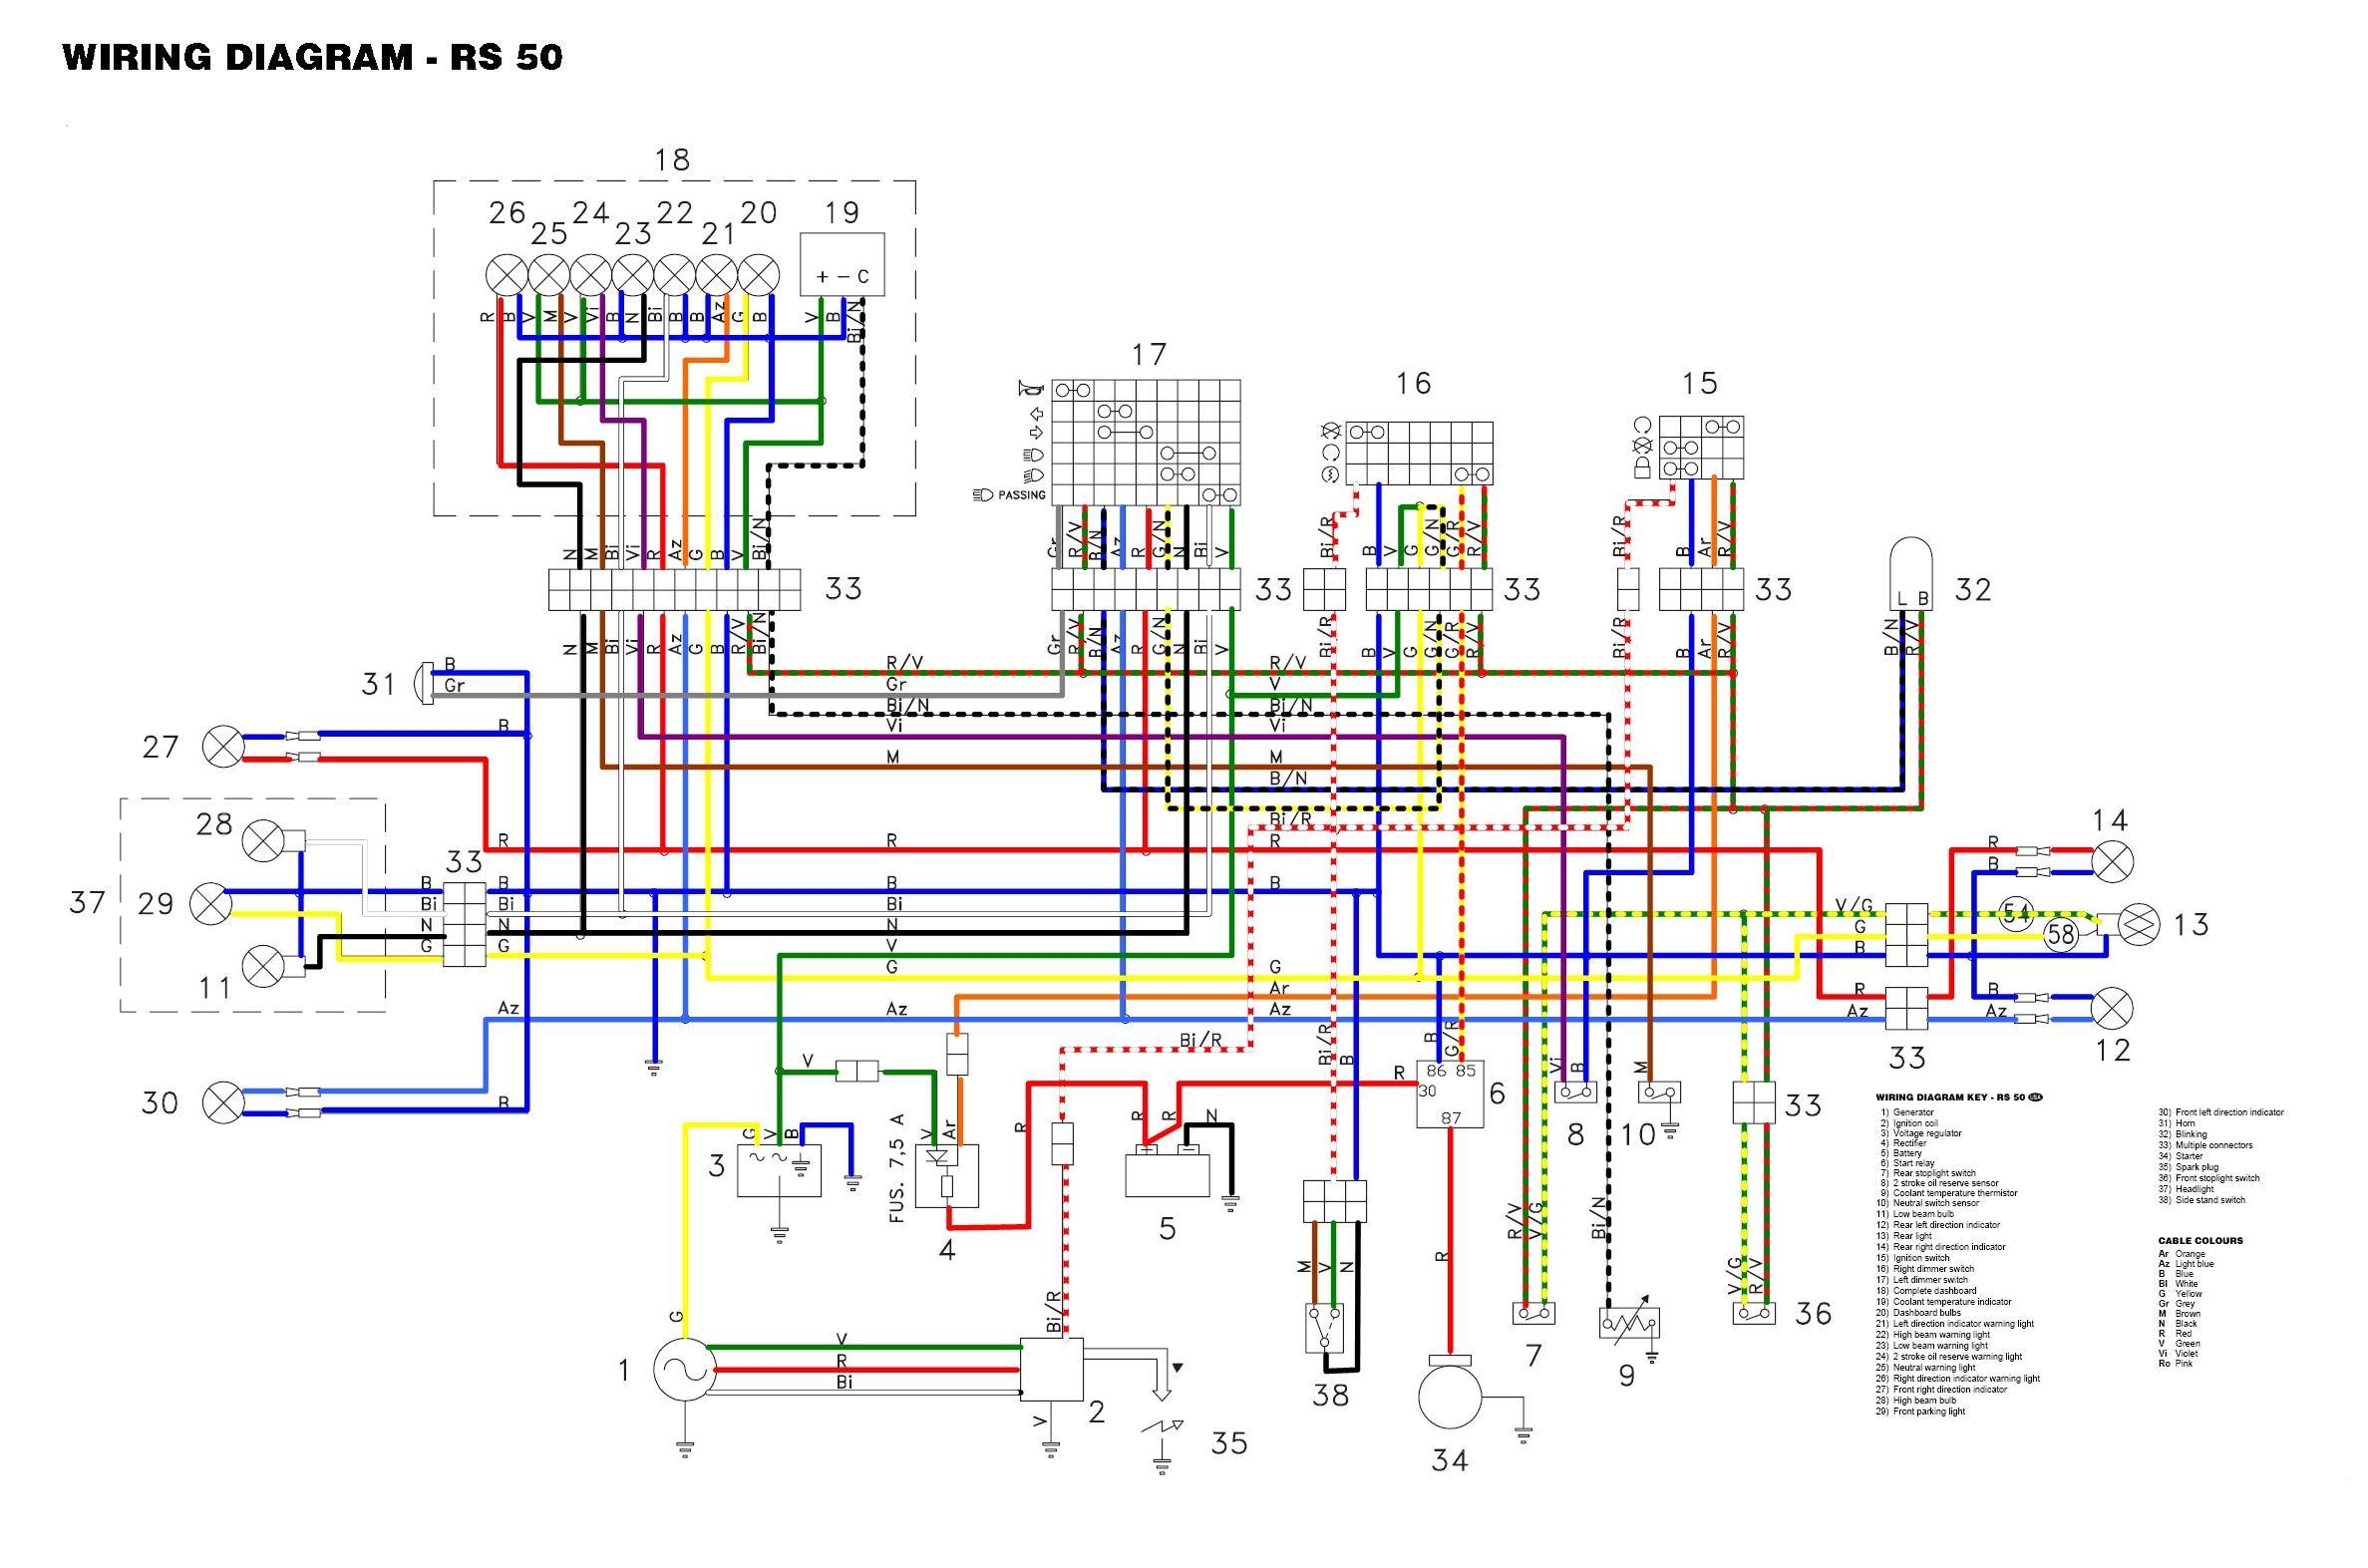 18 Aprilia Sr50 Wiring Diagram Rs50 For Rs 50 Honda Wave Senda